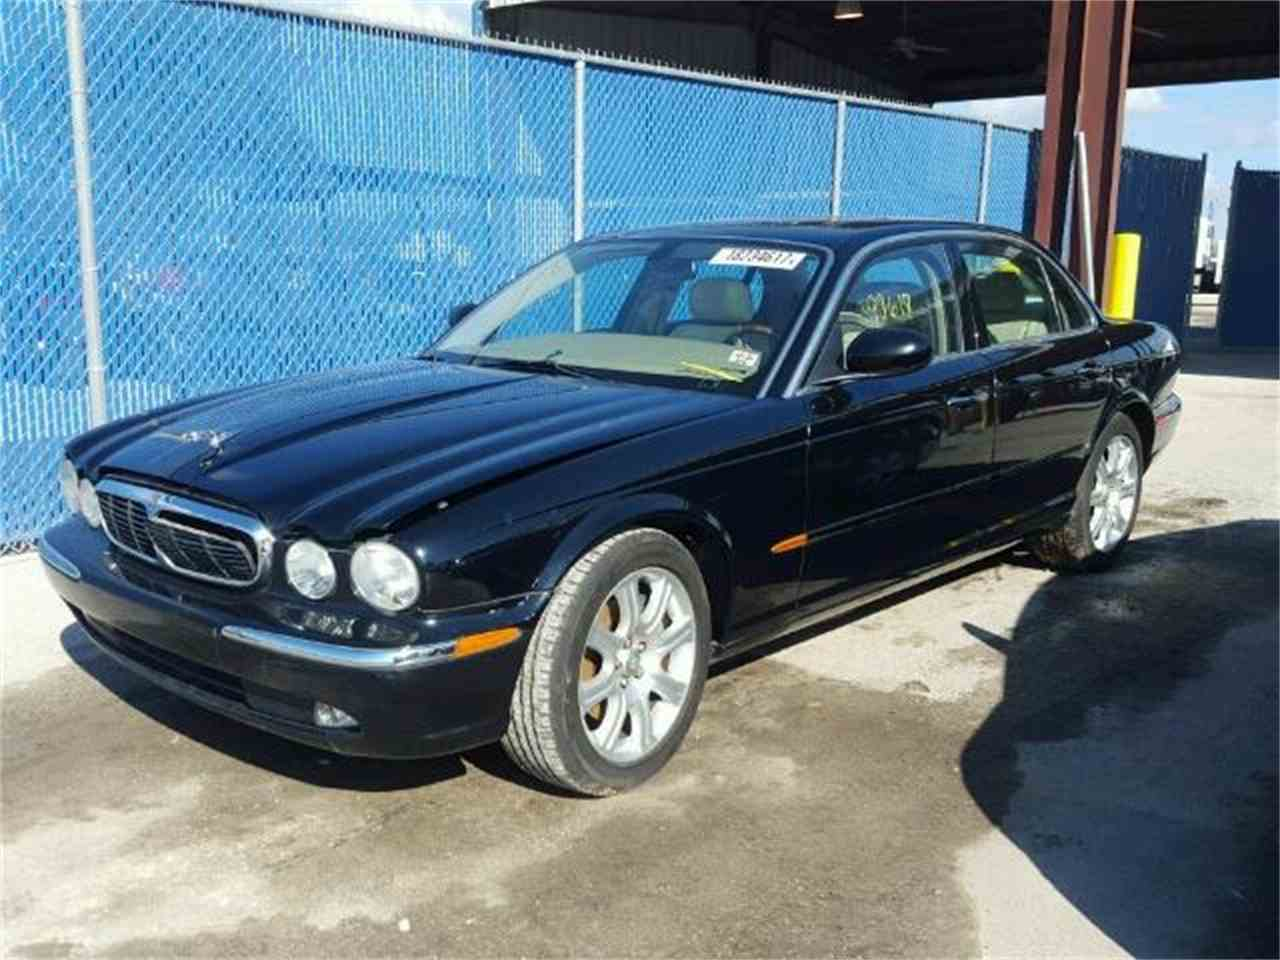 lot en view auctions for copart sale jaguar sacramento left ca on auto salvage carfinder online gold in certificate